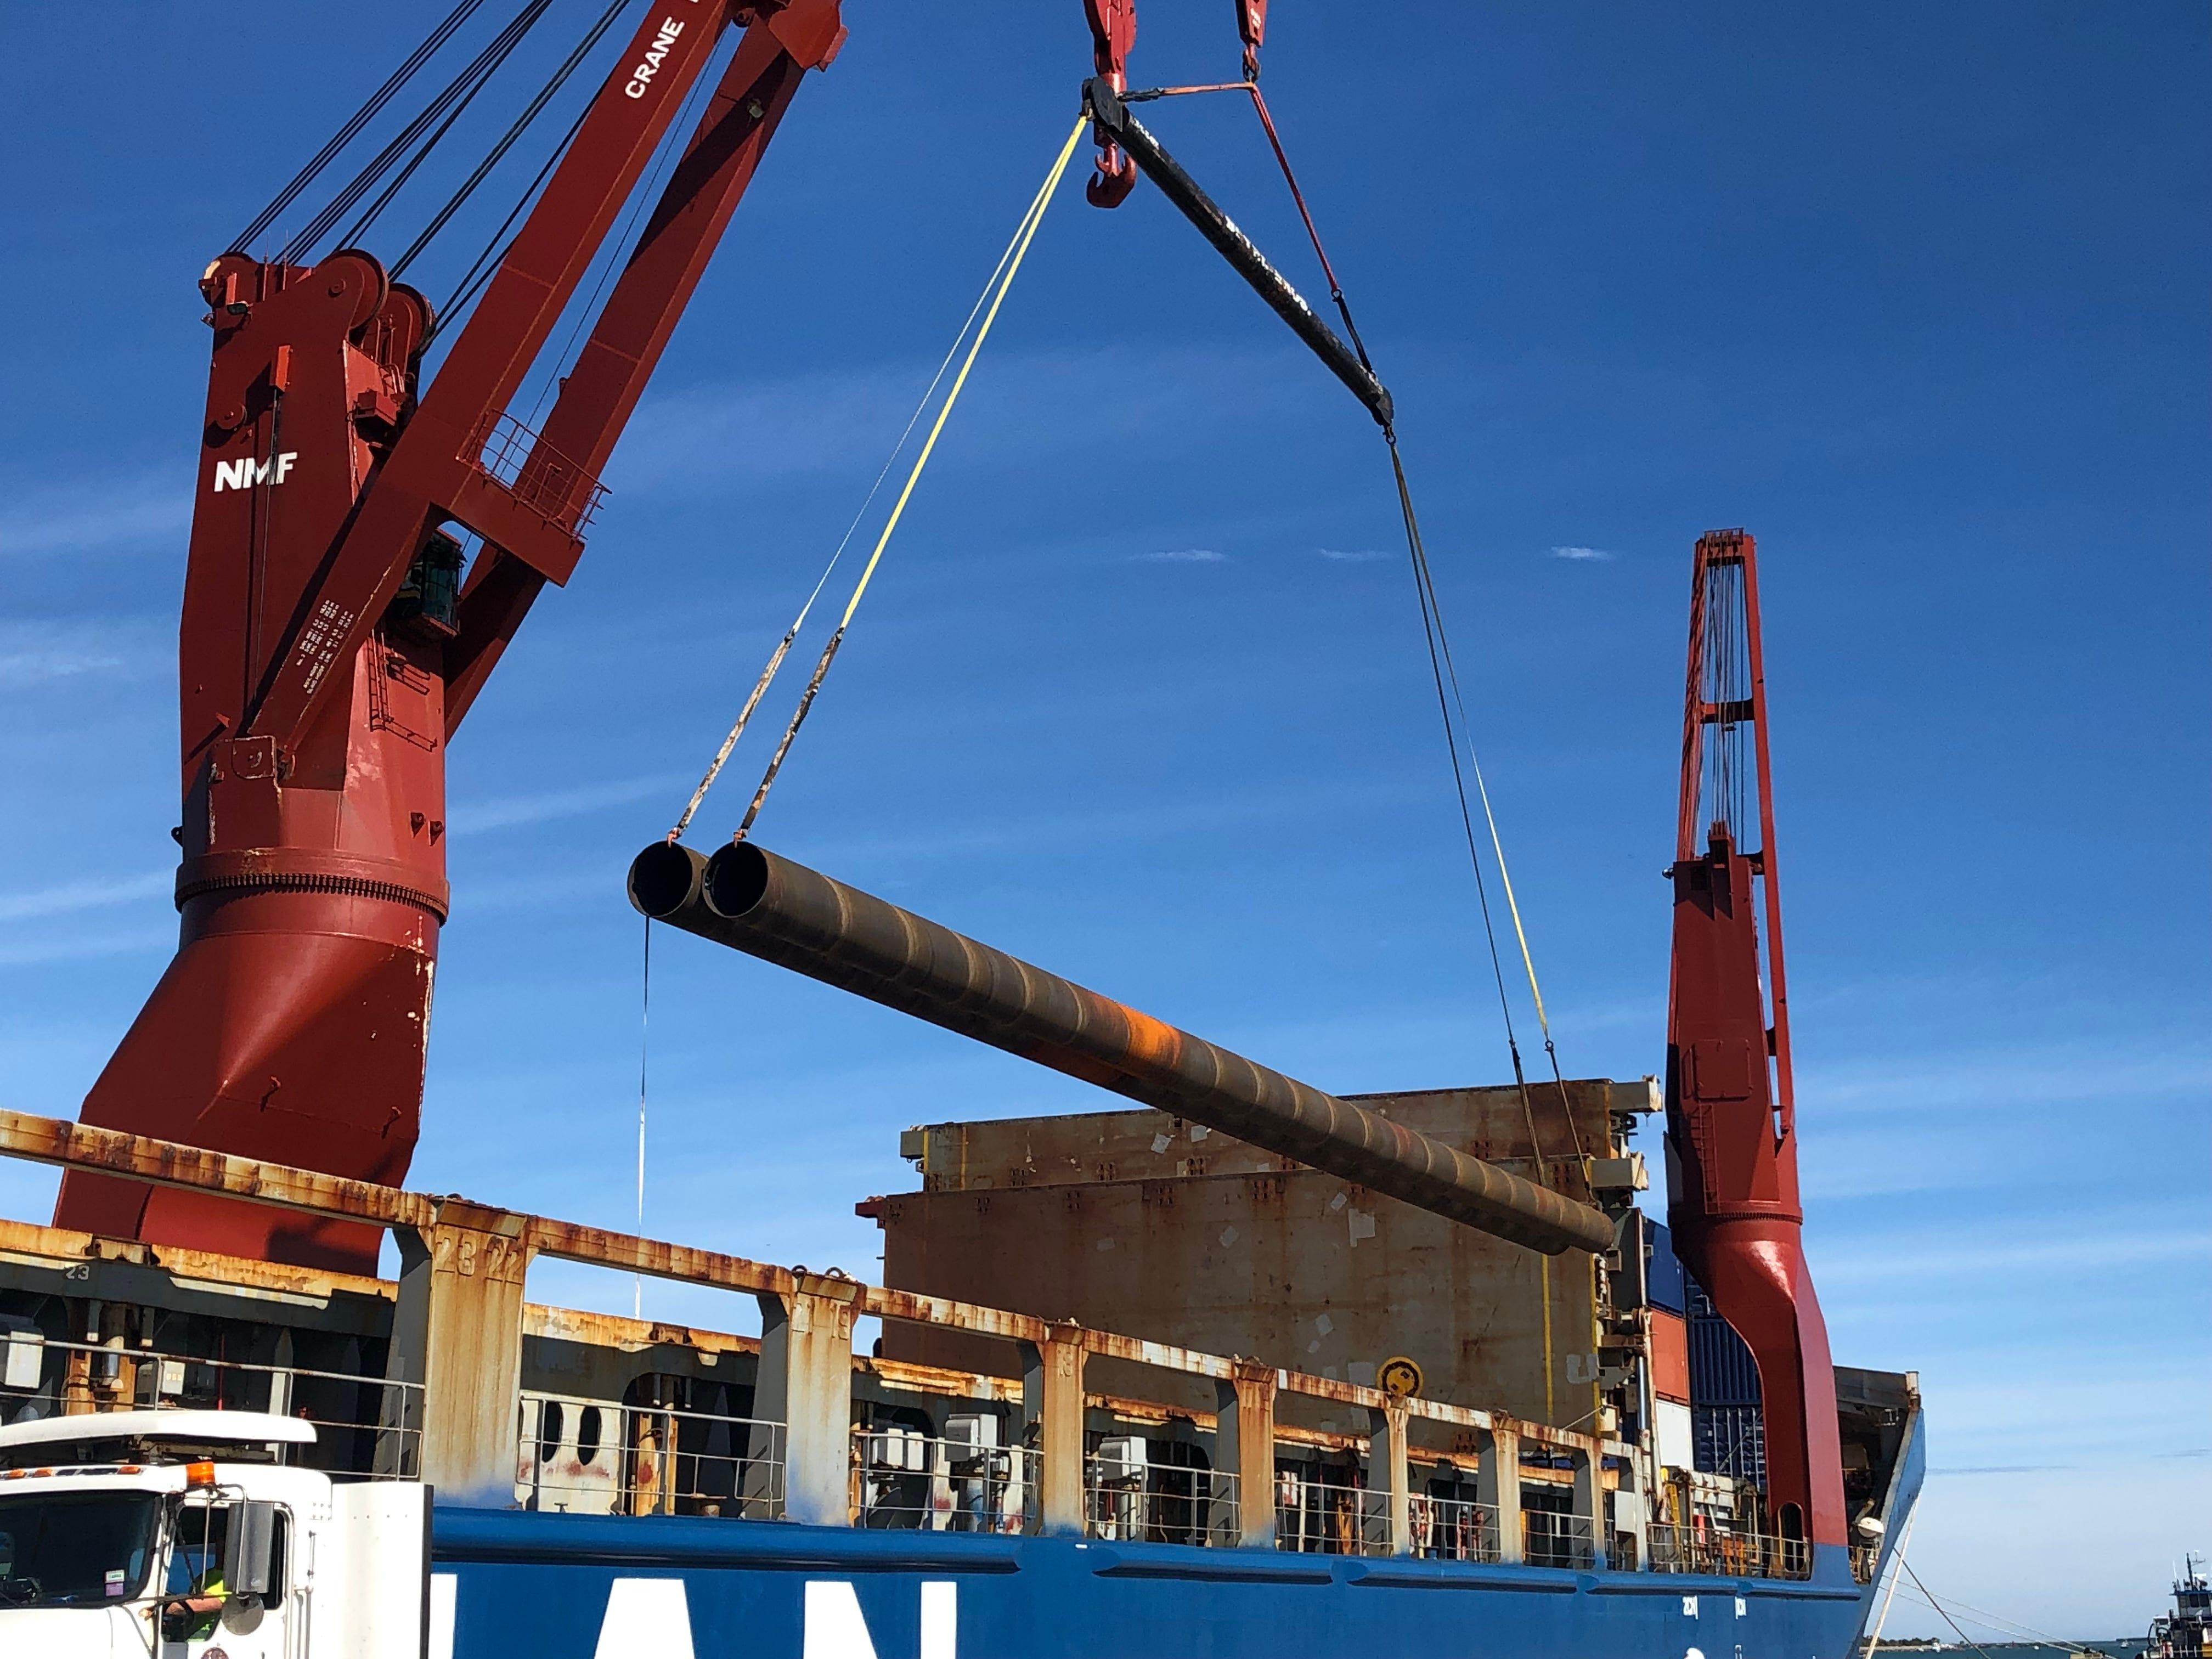 3654c5e8-8e22-4f84-9c6b-22b6ba2a64a3-1st_Steel_PHOTO7 Port to decide on bonding for $150M cruise terminal complex, as garage bid exceeds estimate